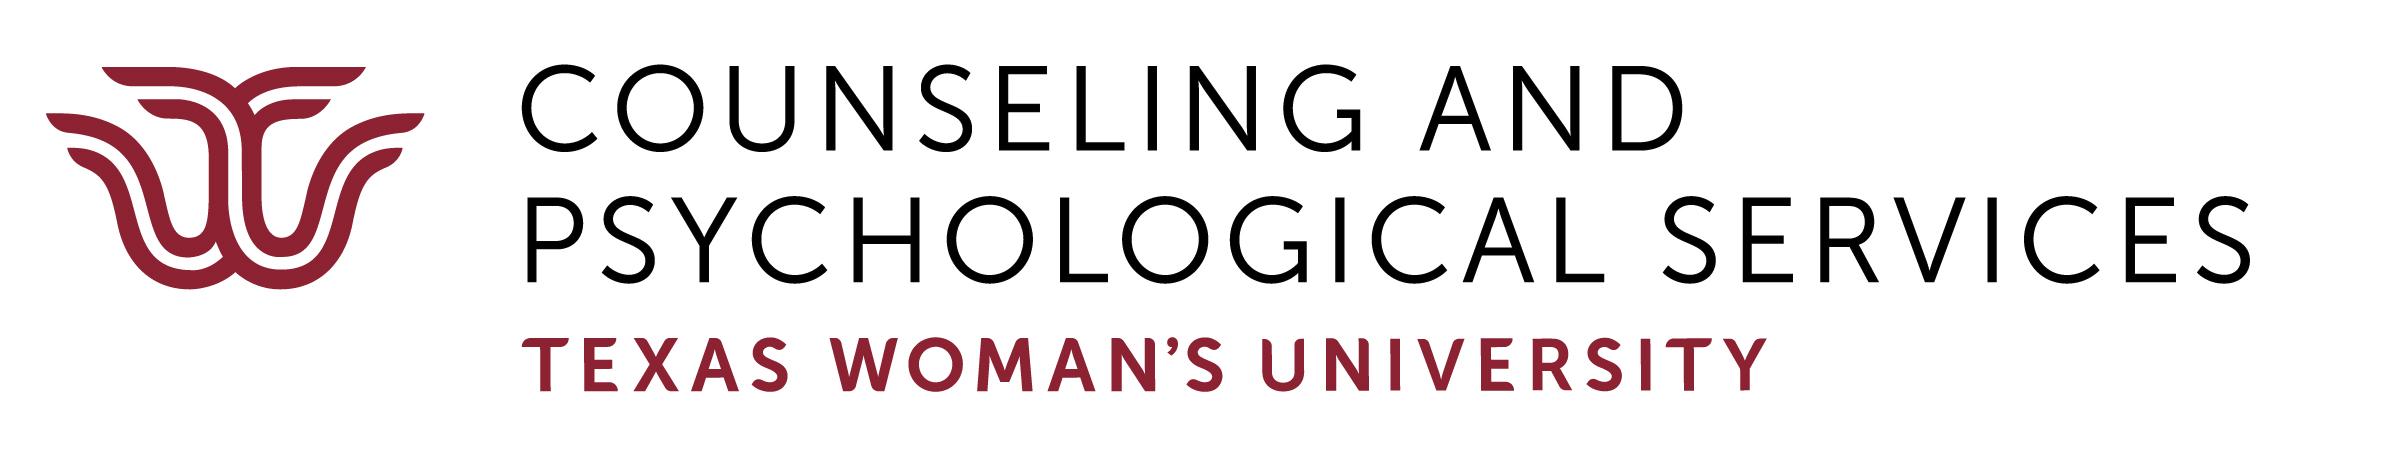 University Counseling Jobs